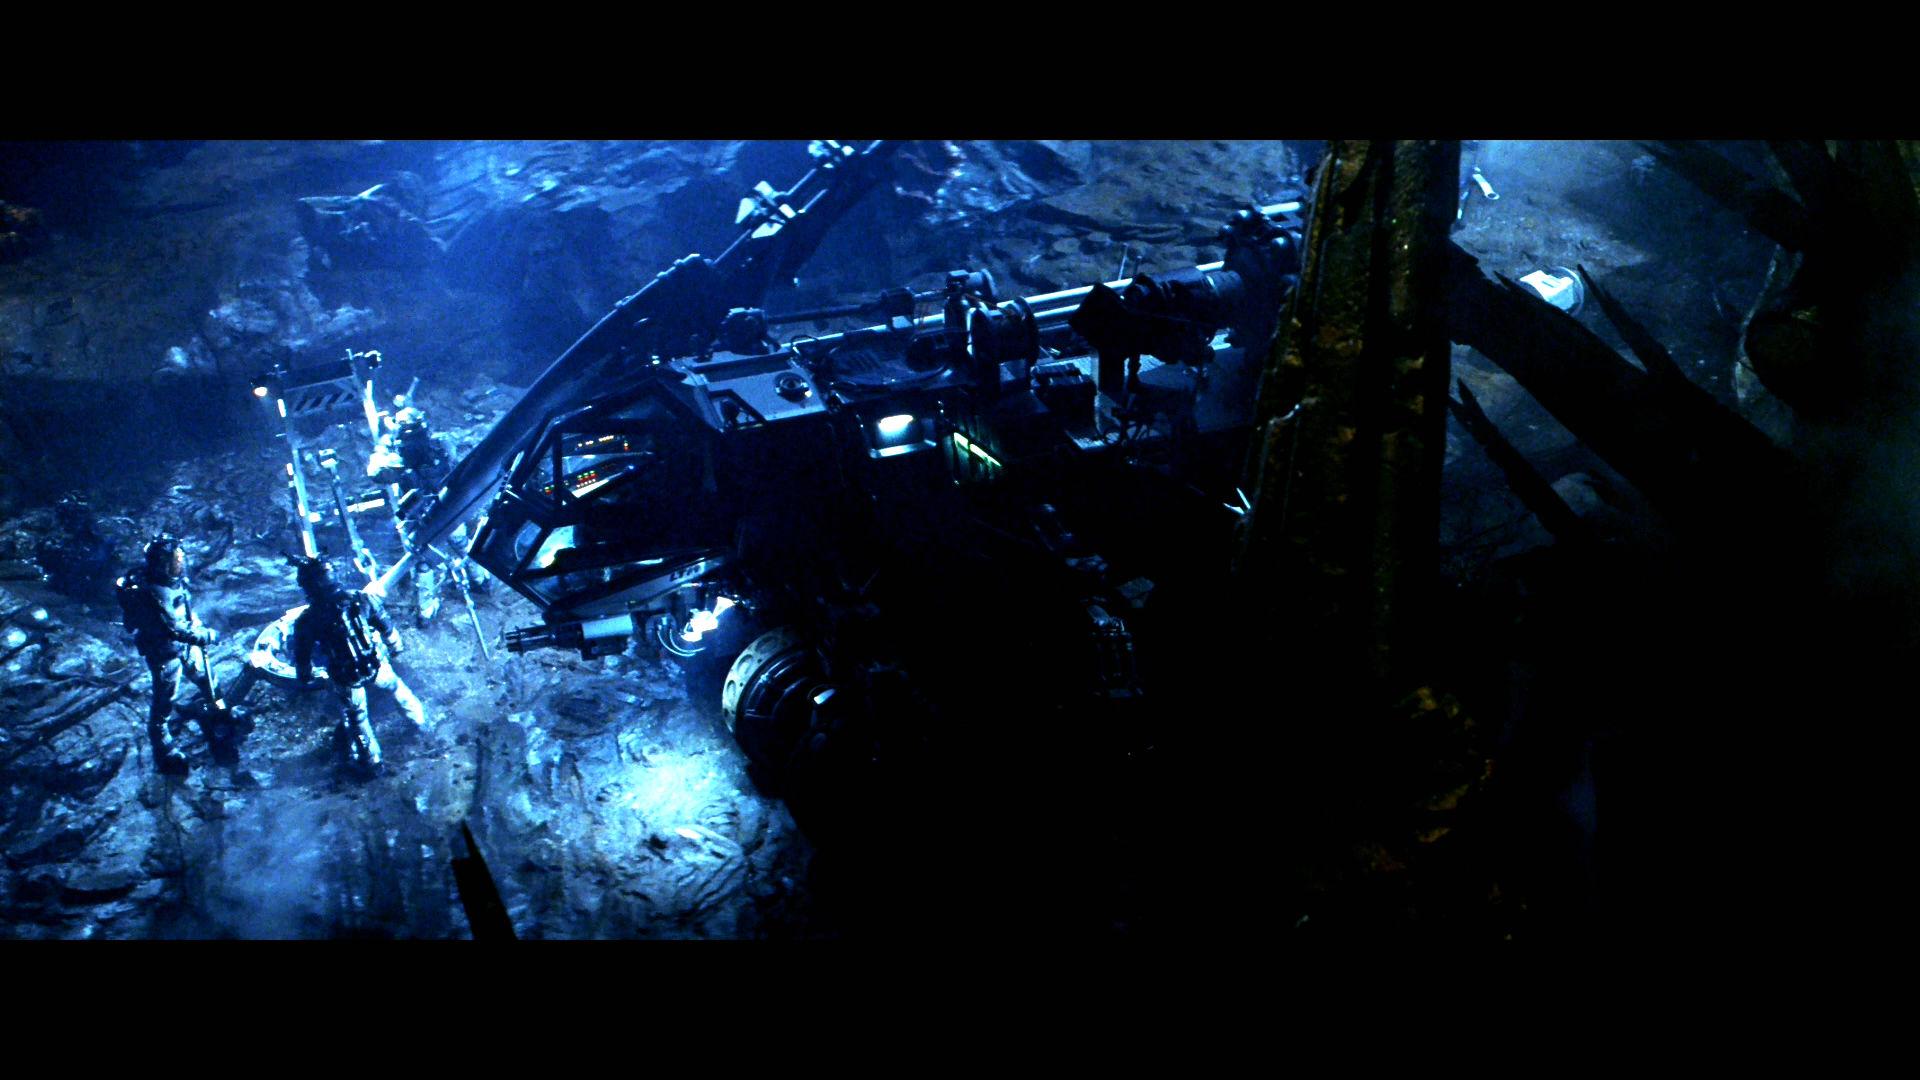 ARMAGEDDON action adventure sci-fi fa wallpaper background